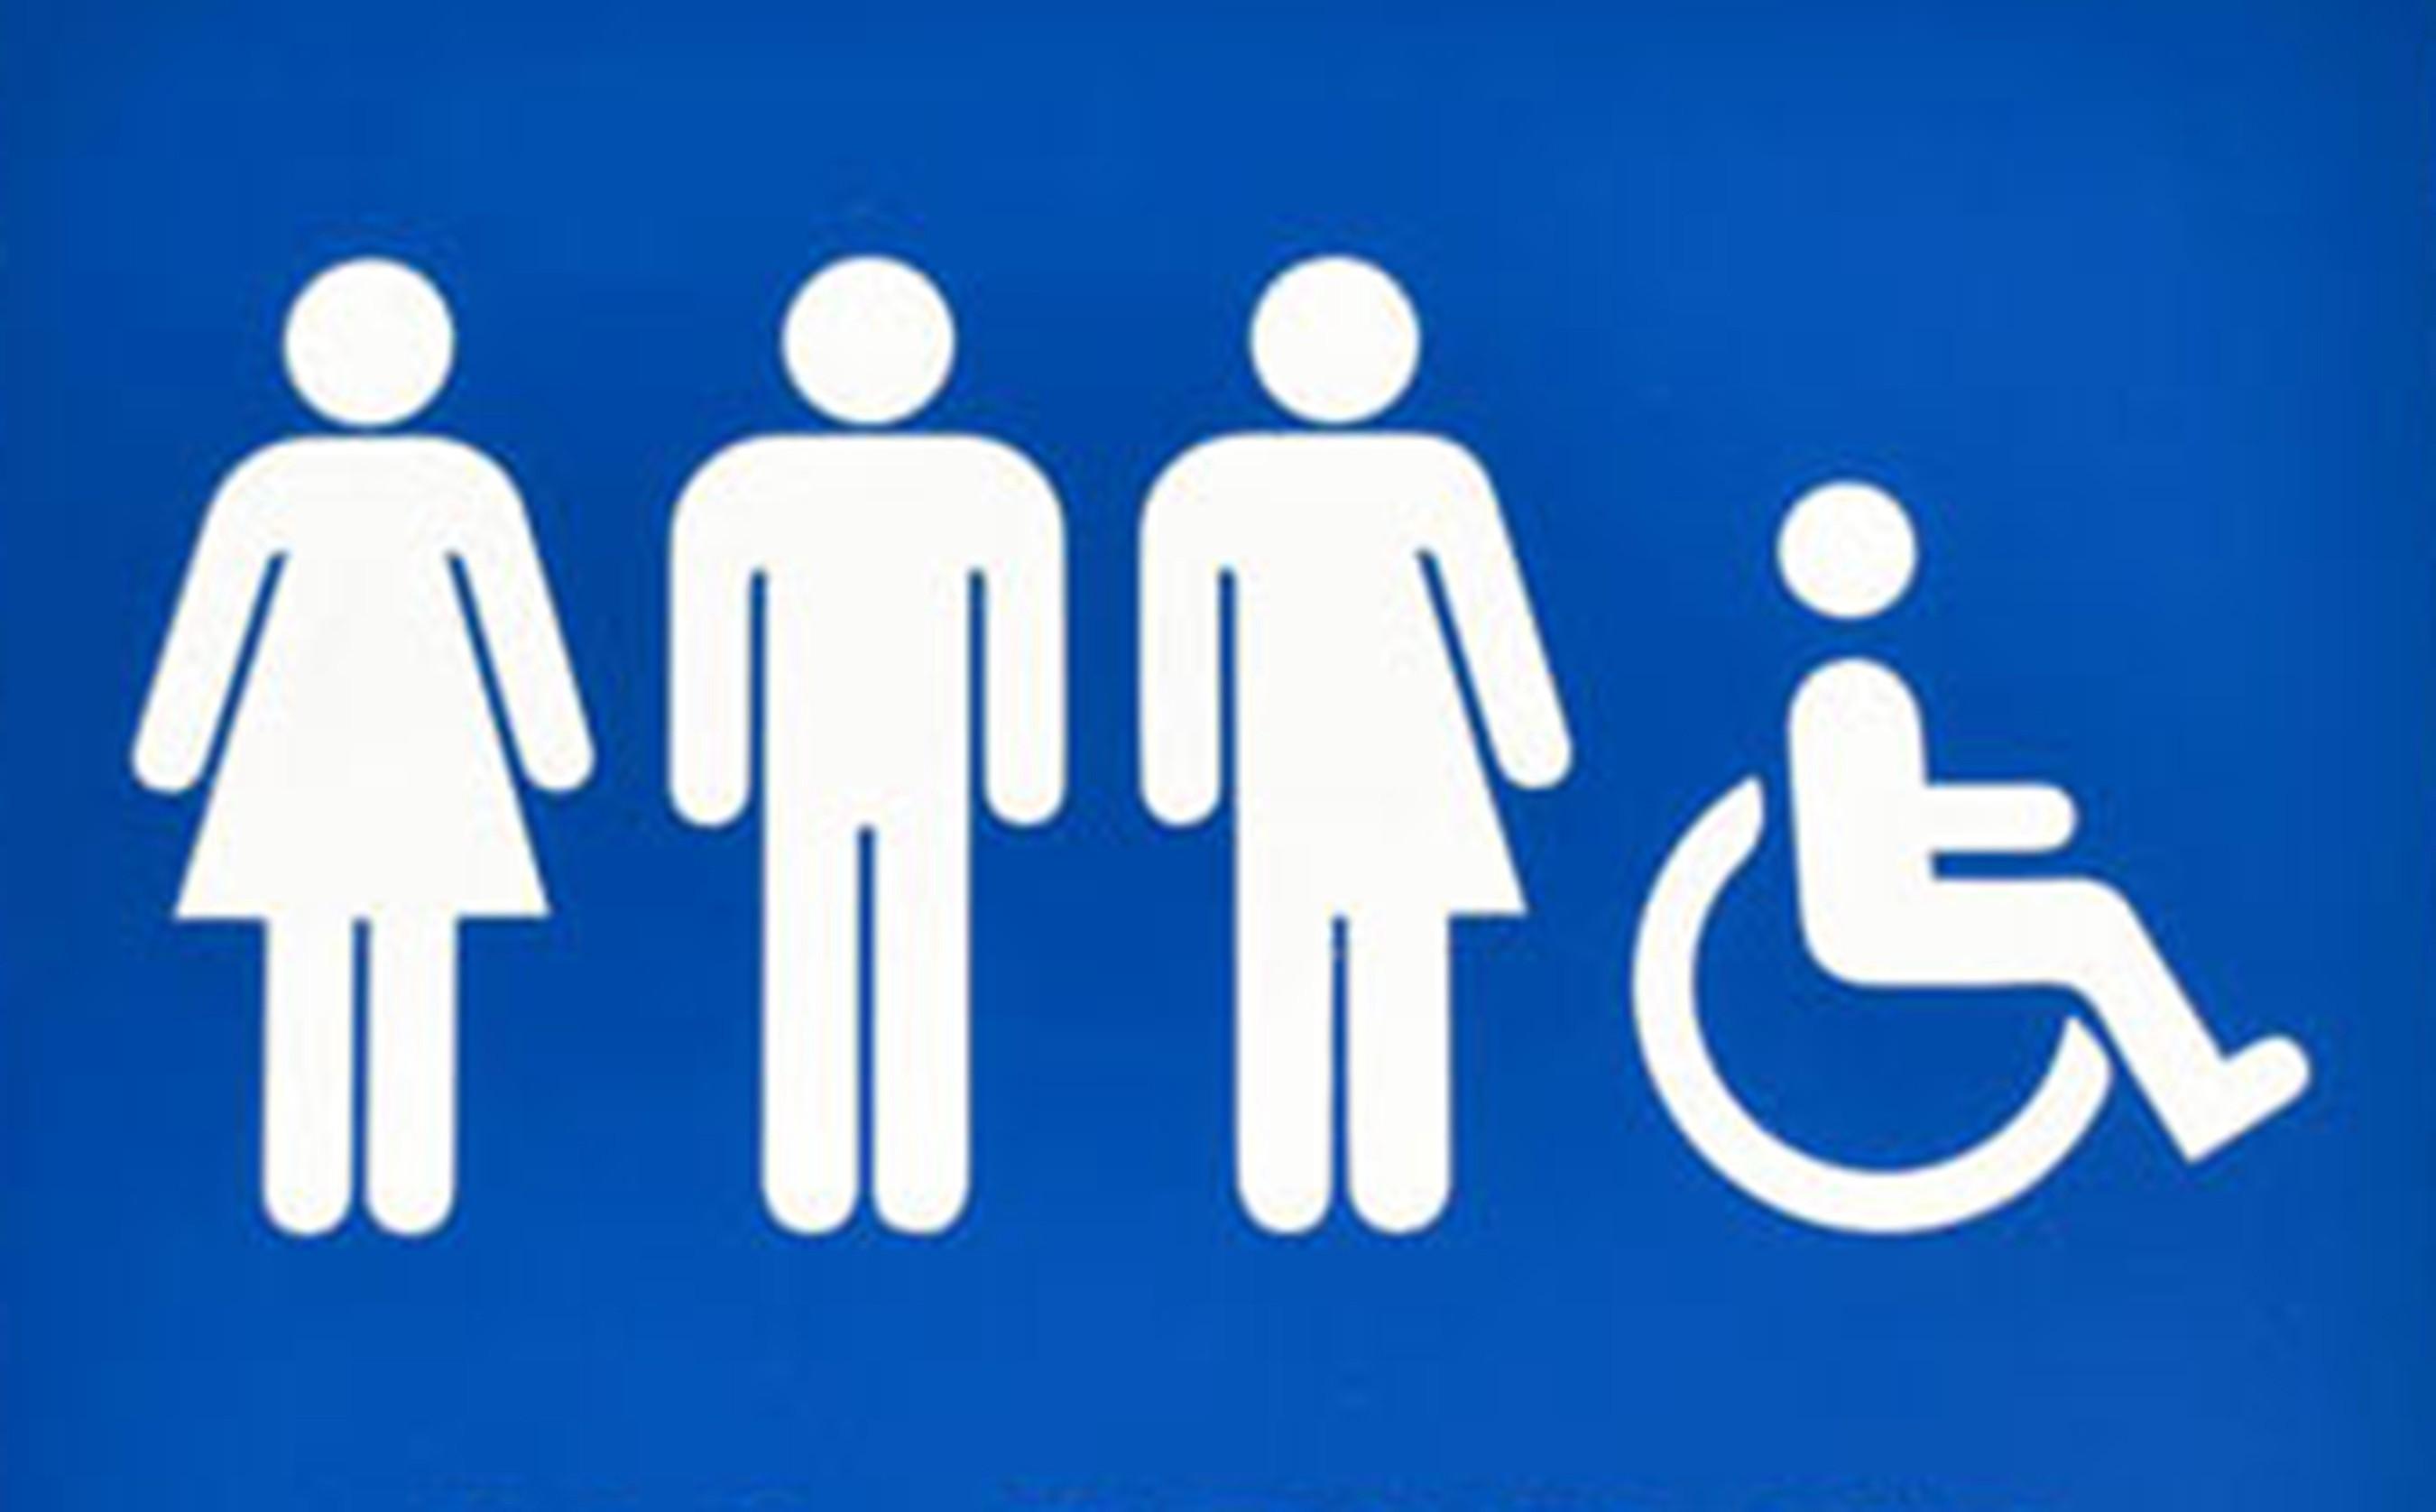 #BeExcellent: Welcoming Audiences of All Genders